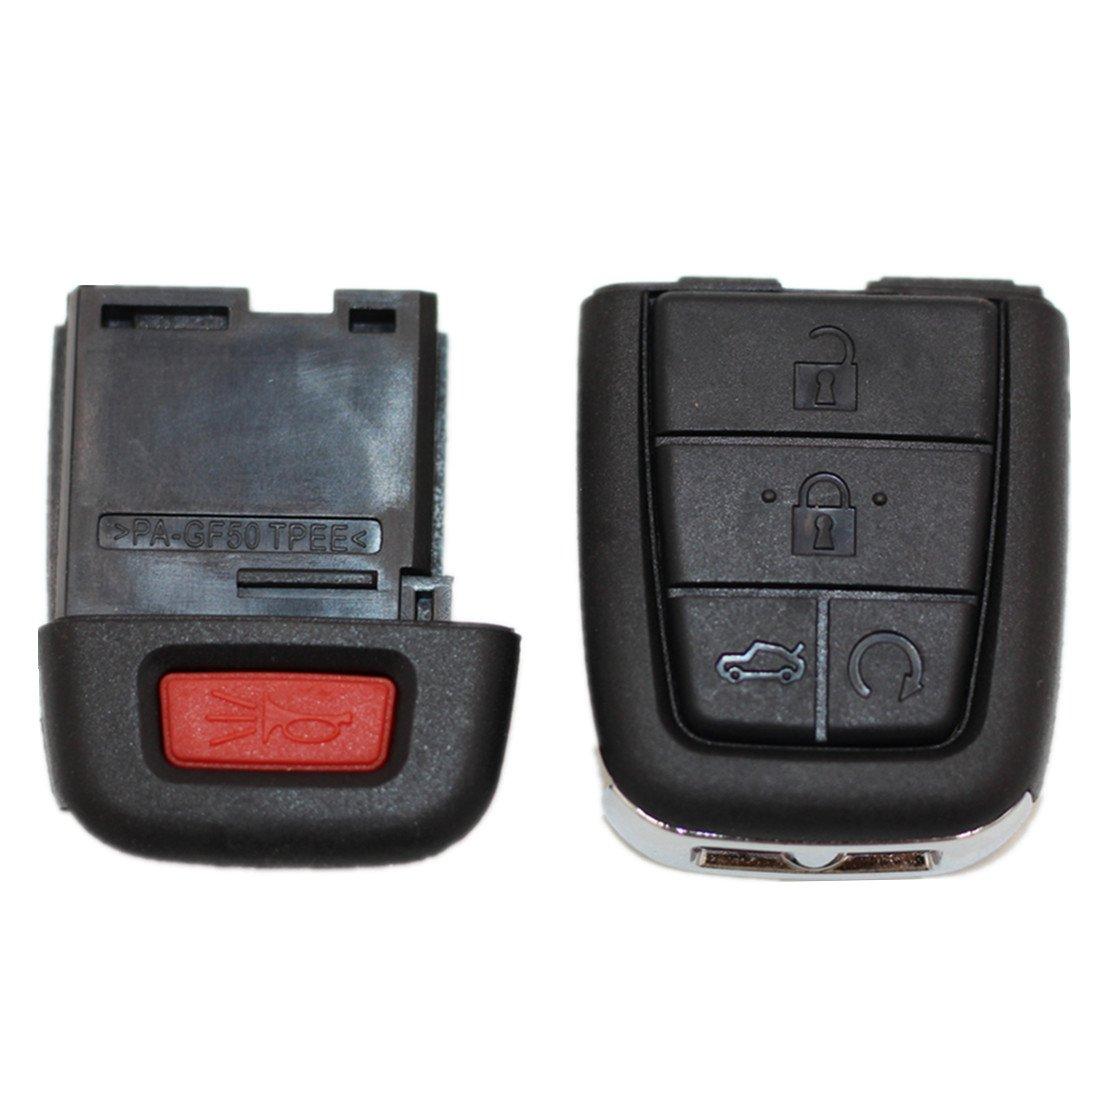 Ezzy Auto Key Fob Shell Cover Smart Keyless Entry Remote Case for 2008 Pontiac G8 2009 Pontiac G8 5 Buttons